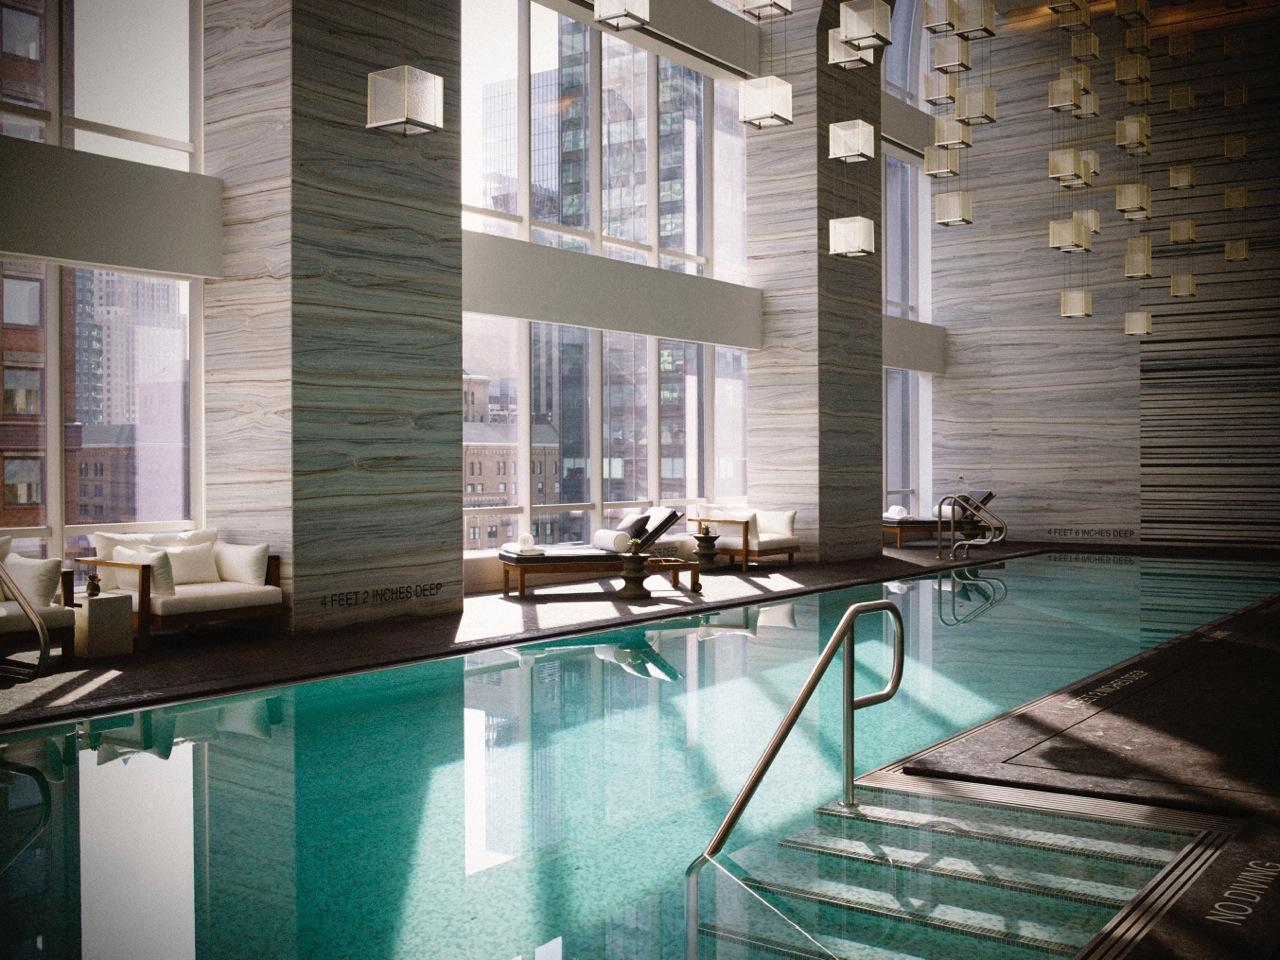 NYCPH_P092 Pool